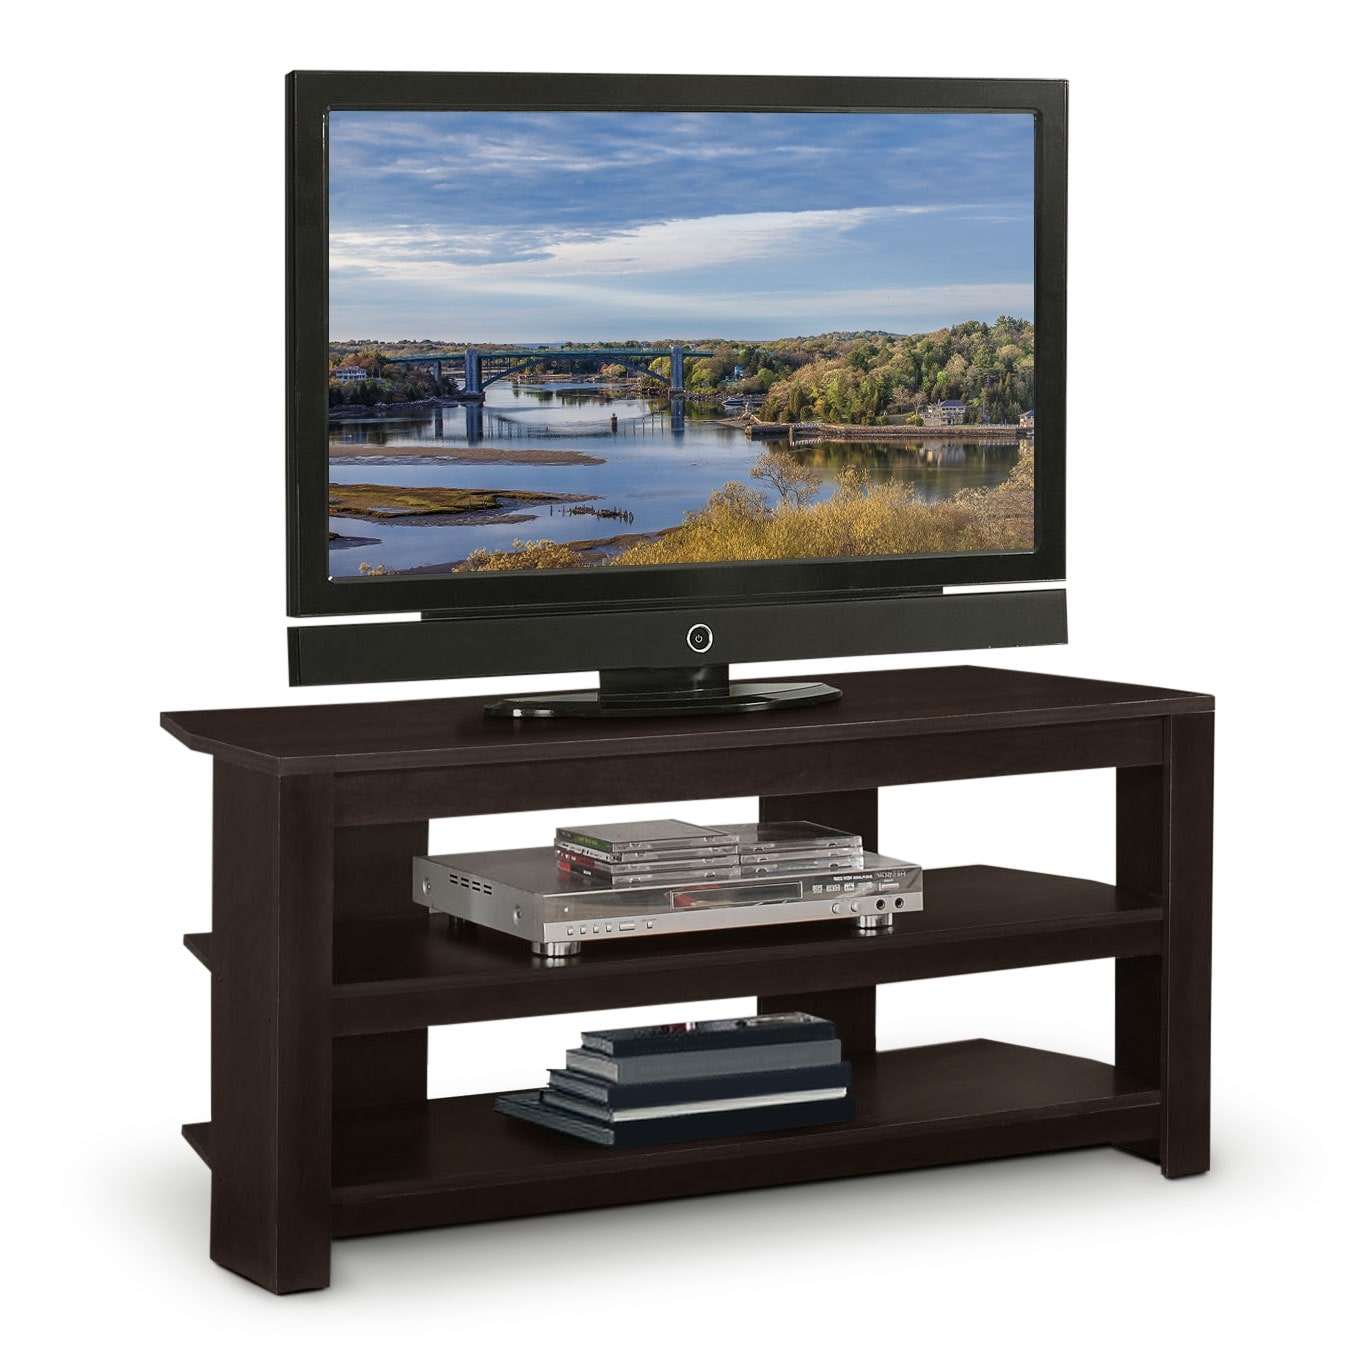 Damro Tv Stand Designs : Damro furniture tv stand tom wood